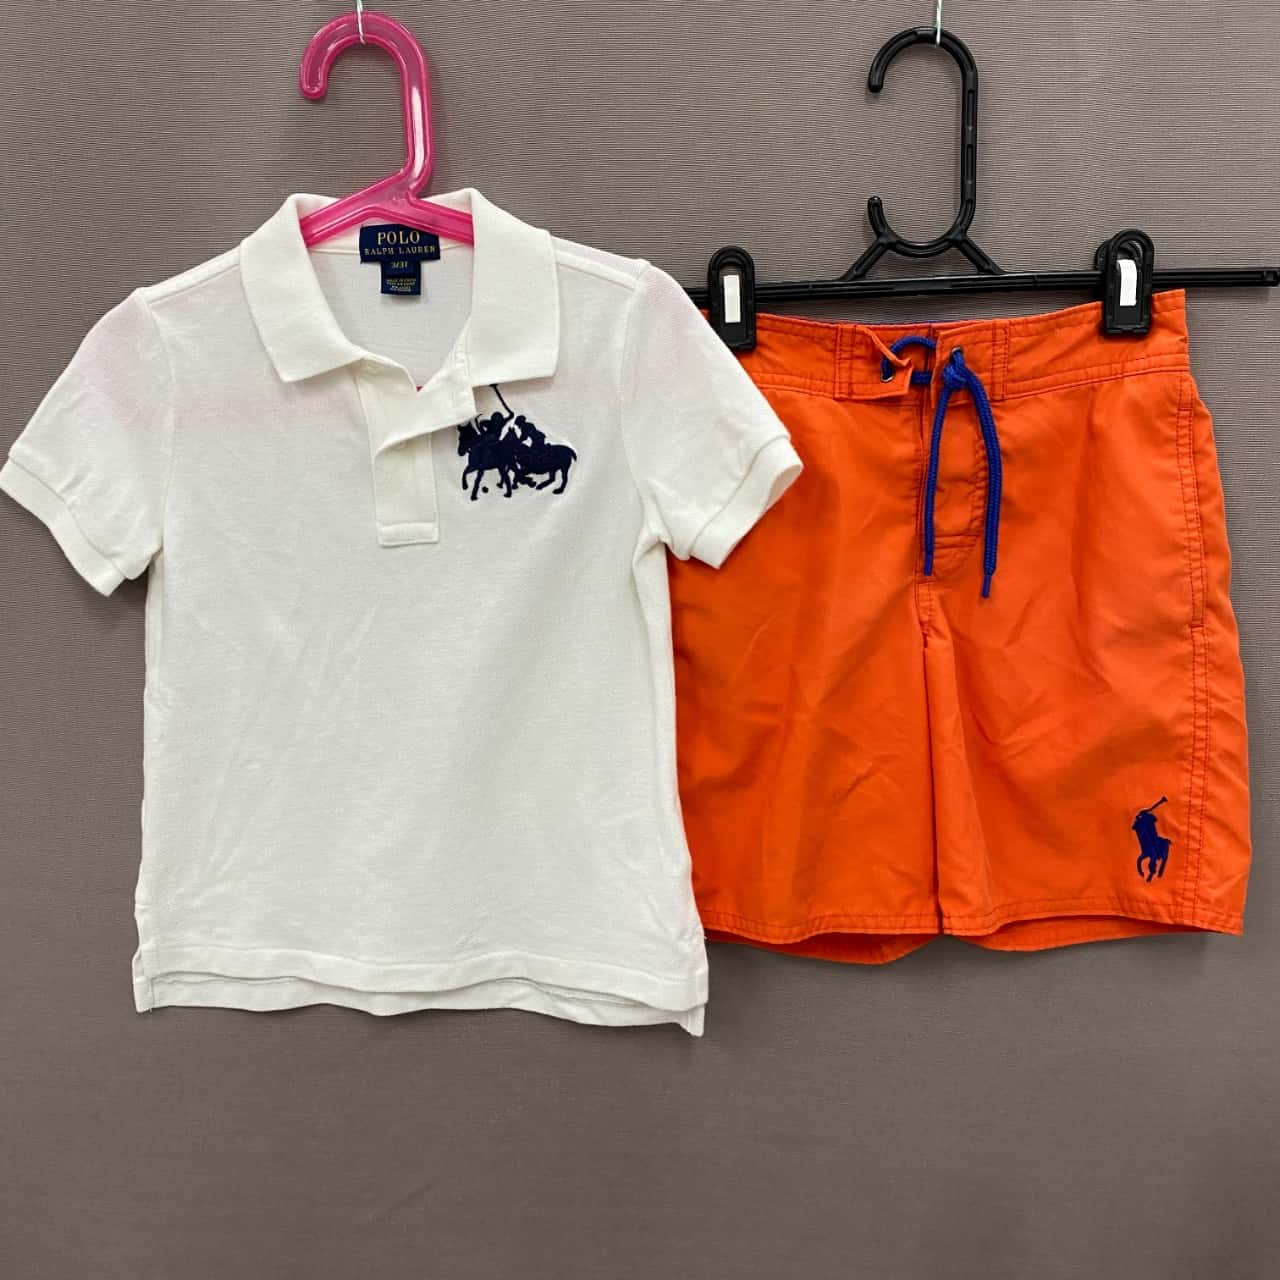 Polo Ralph Lauren Kids Shorts and Polo Size 5 Orange/White